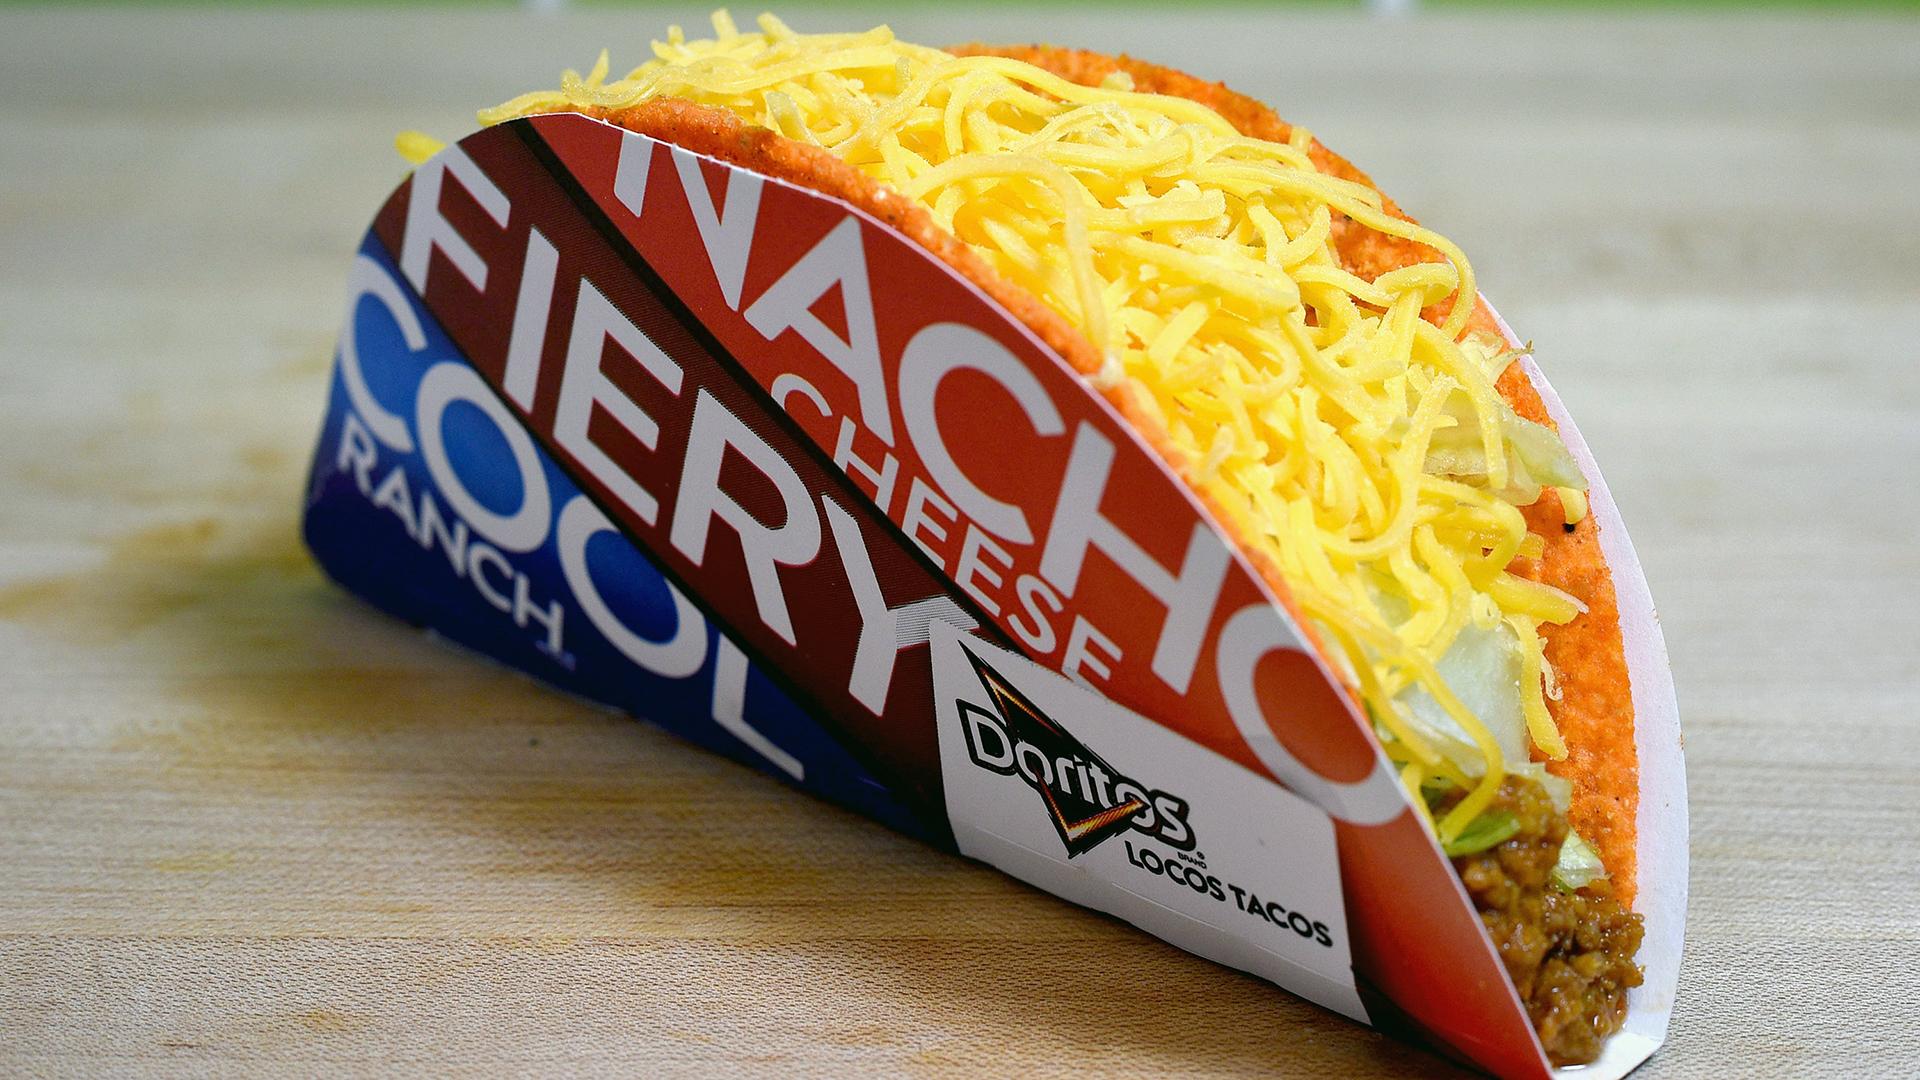 Doritos Locos Taco at Taco Bell-159532.jpg07894851